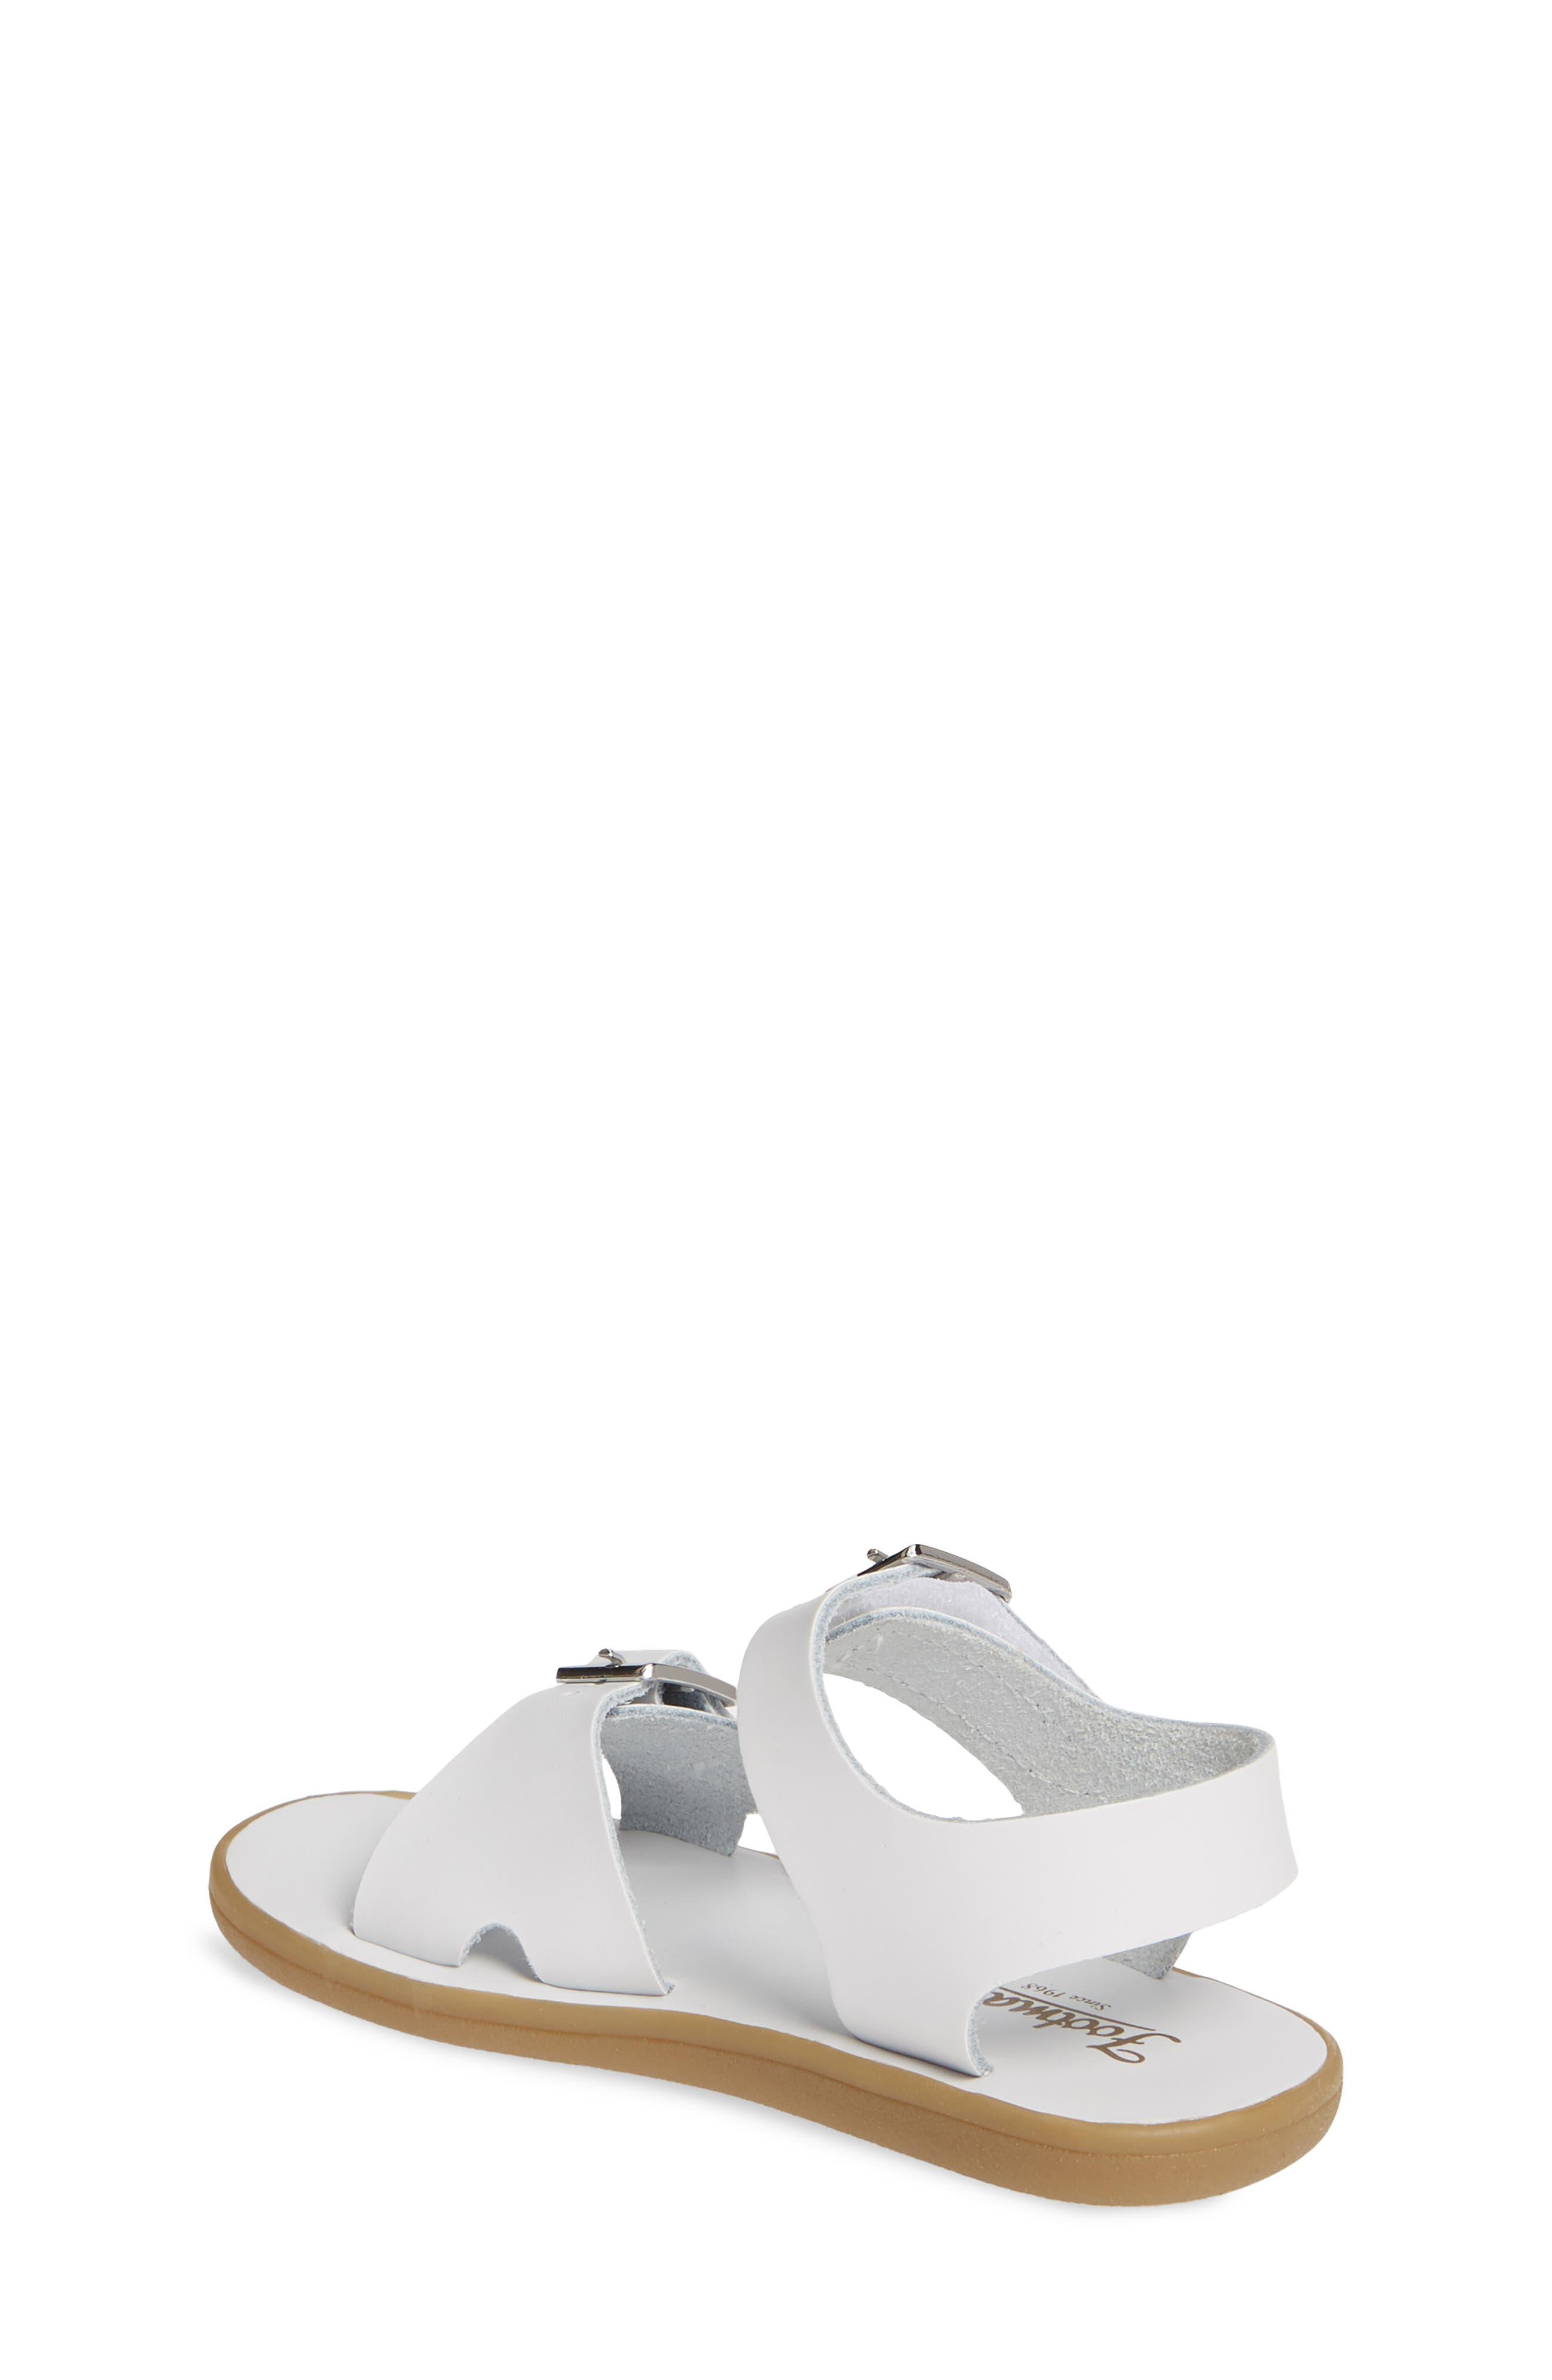 FOOTMATES,                             Tide Waterproof Sandal,                             Alternate thumbnail 2, color,                             WHITE